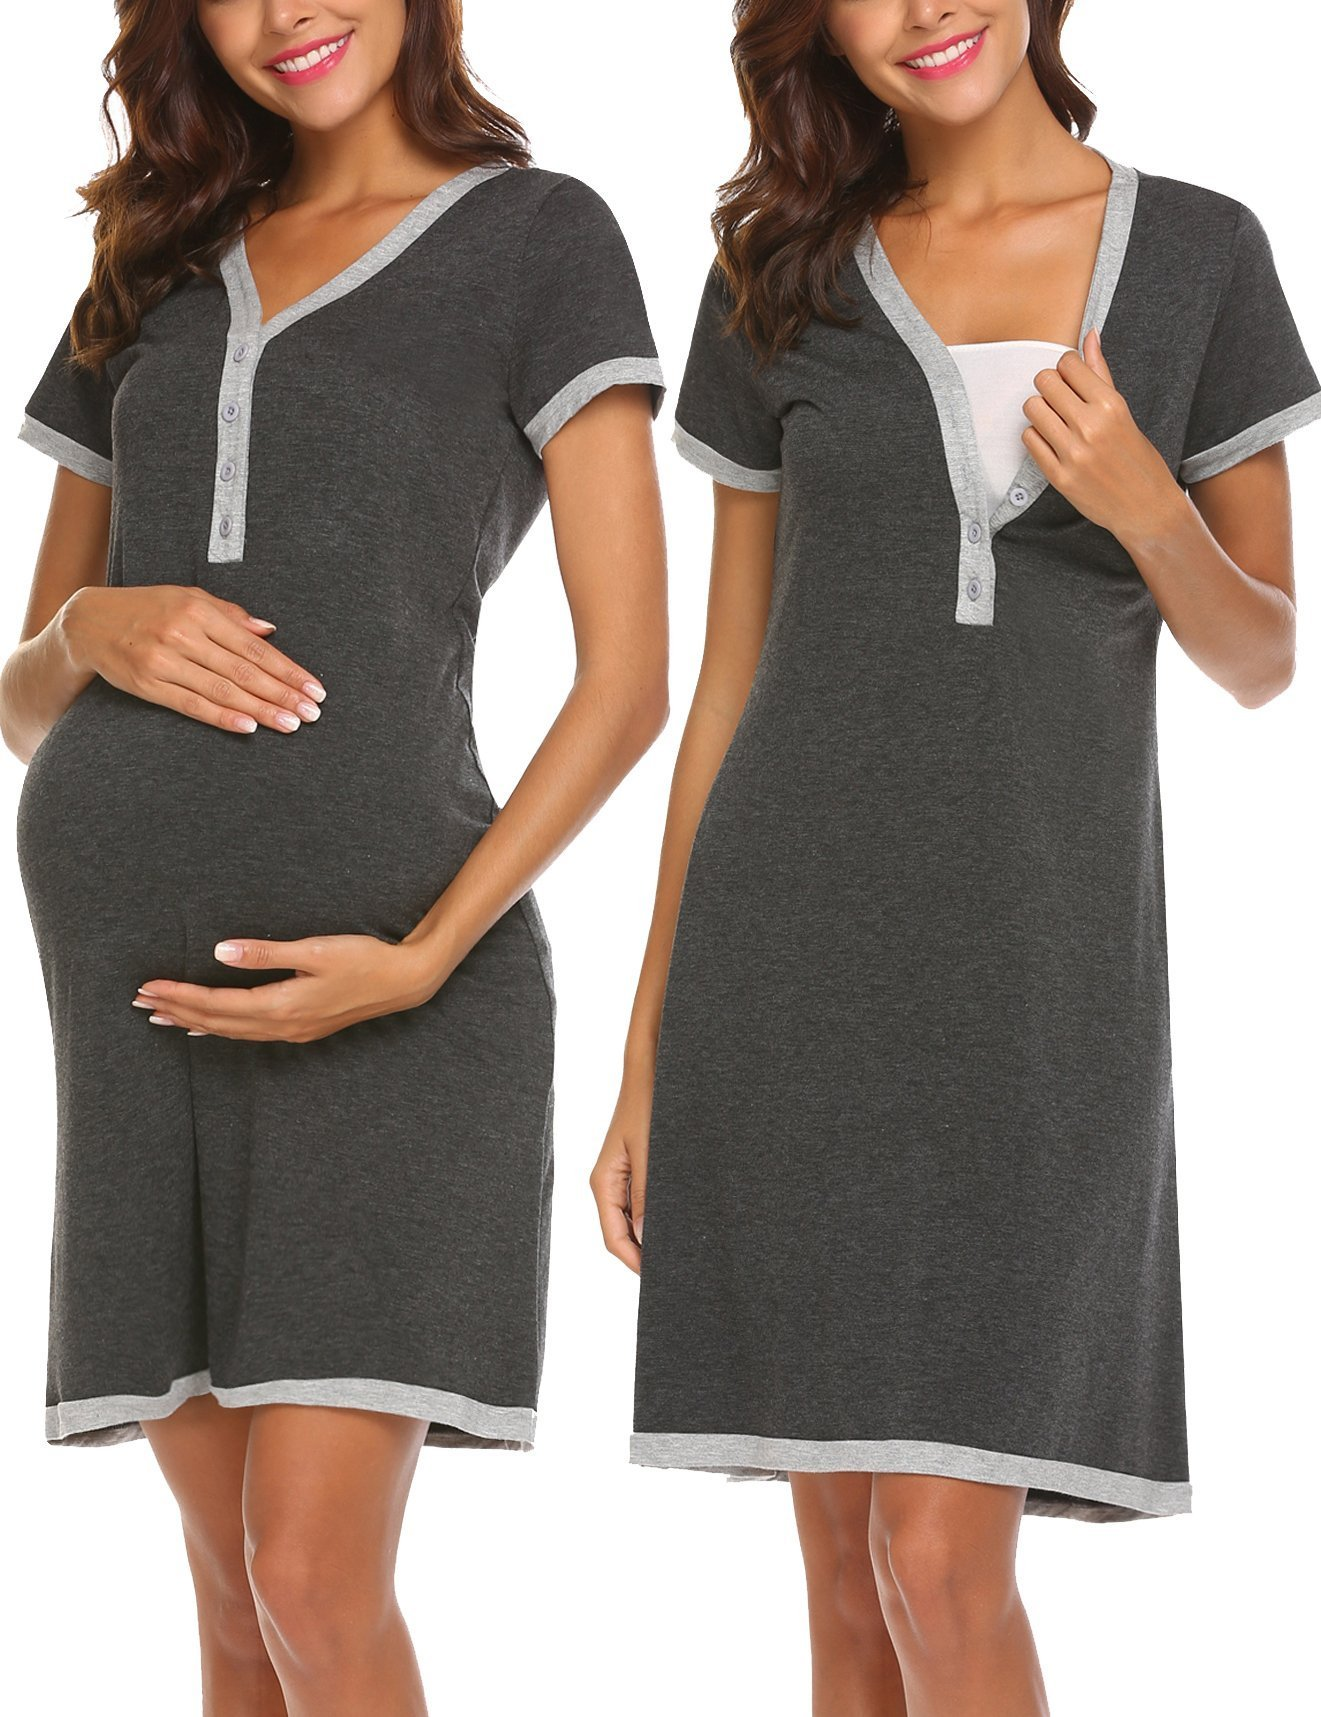 Ekouaer Women's Maternity V-Neck Short Sleeve Patchwork Nursing Breastfeeding Sleepshirts by Ekouaer